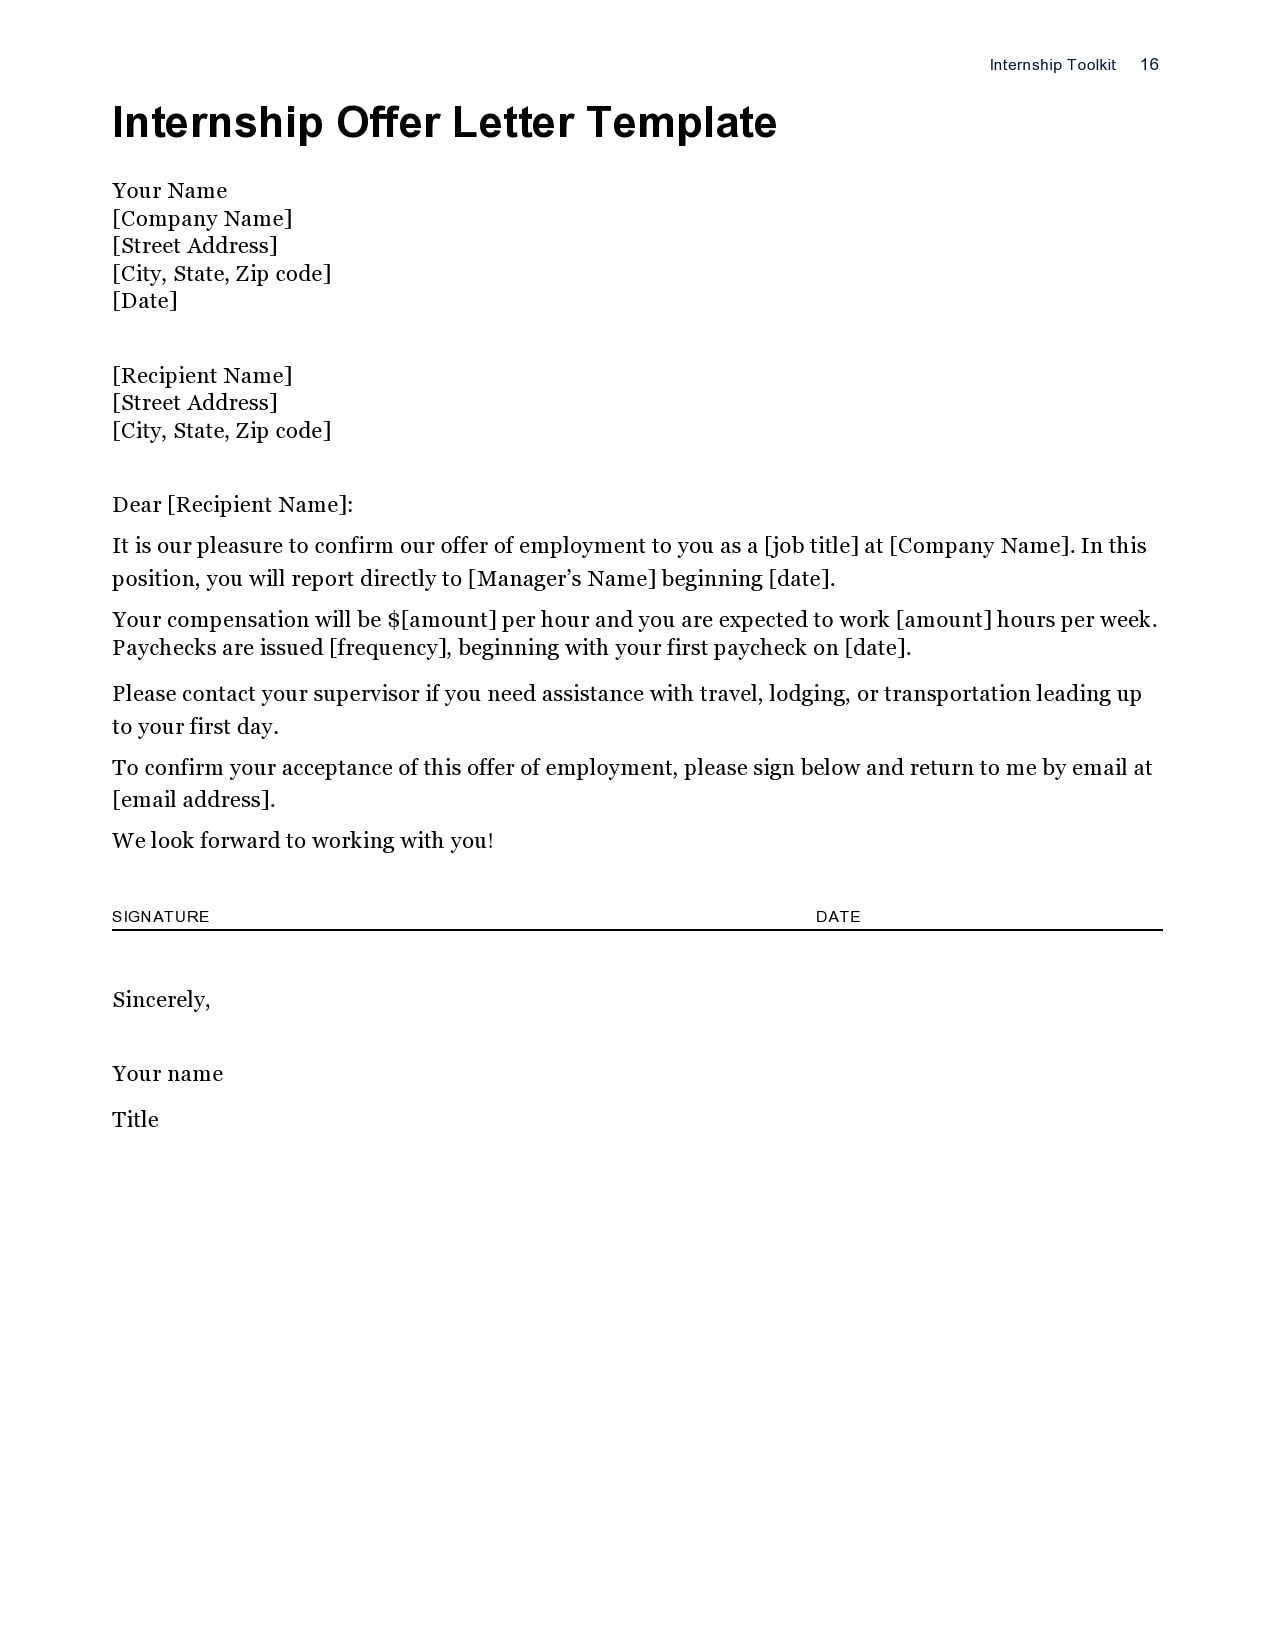 internship offer letter 10